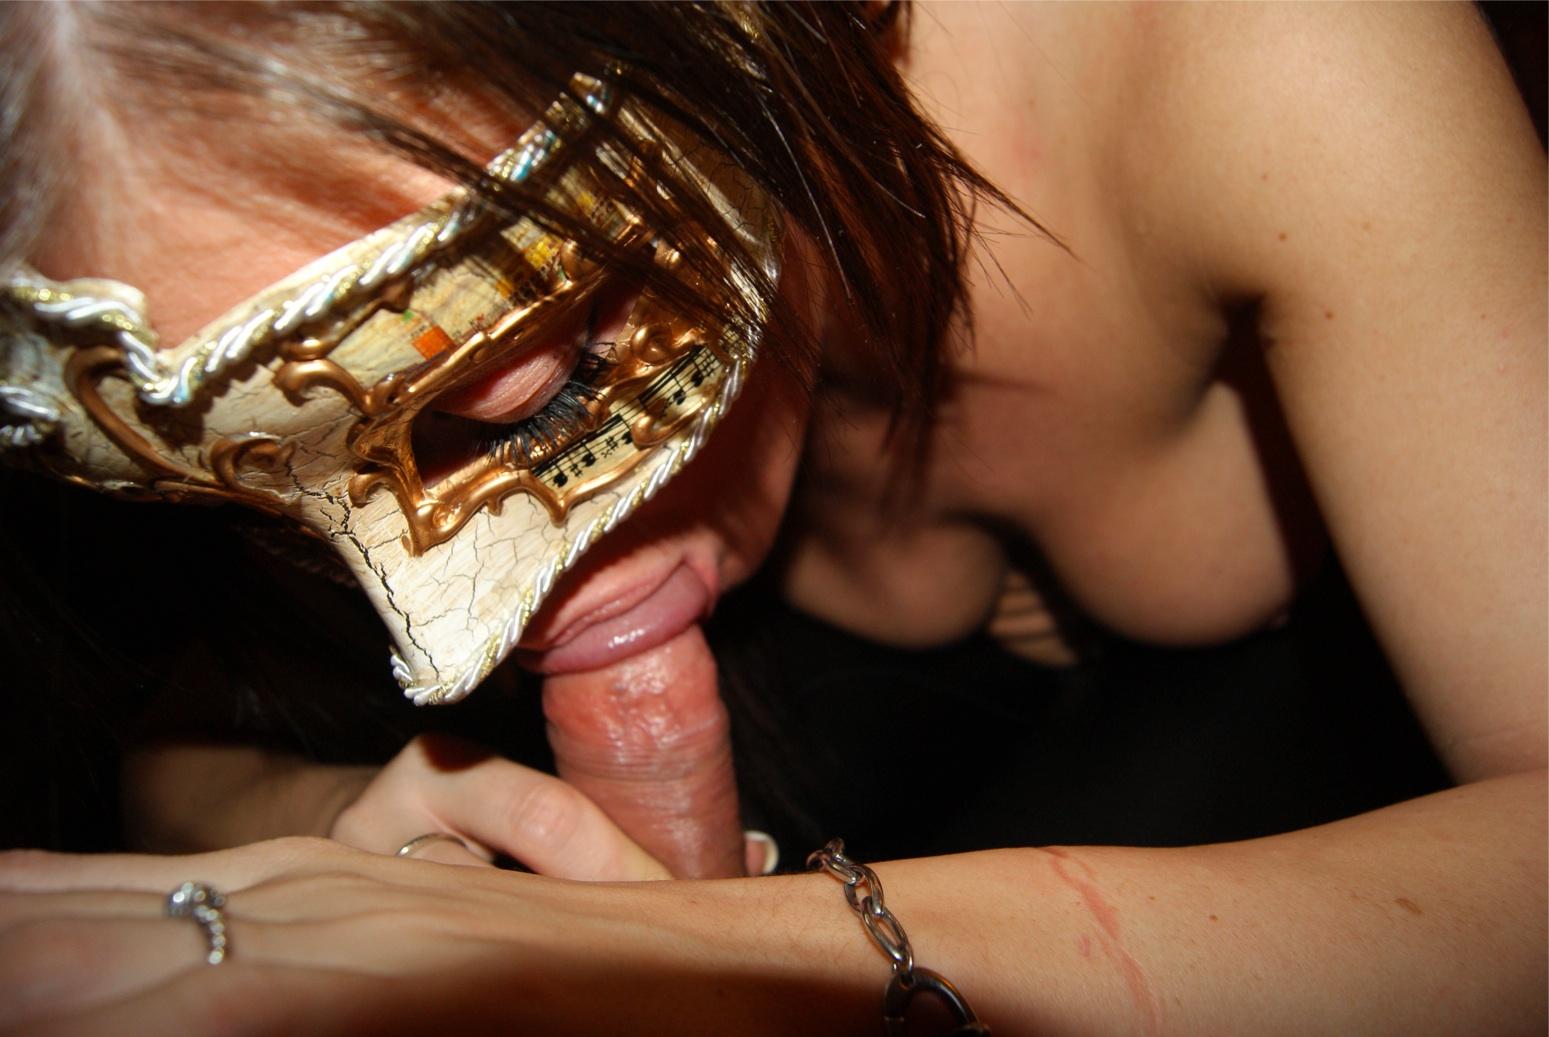 massaggiatrici italiane foto prostitute strada